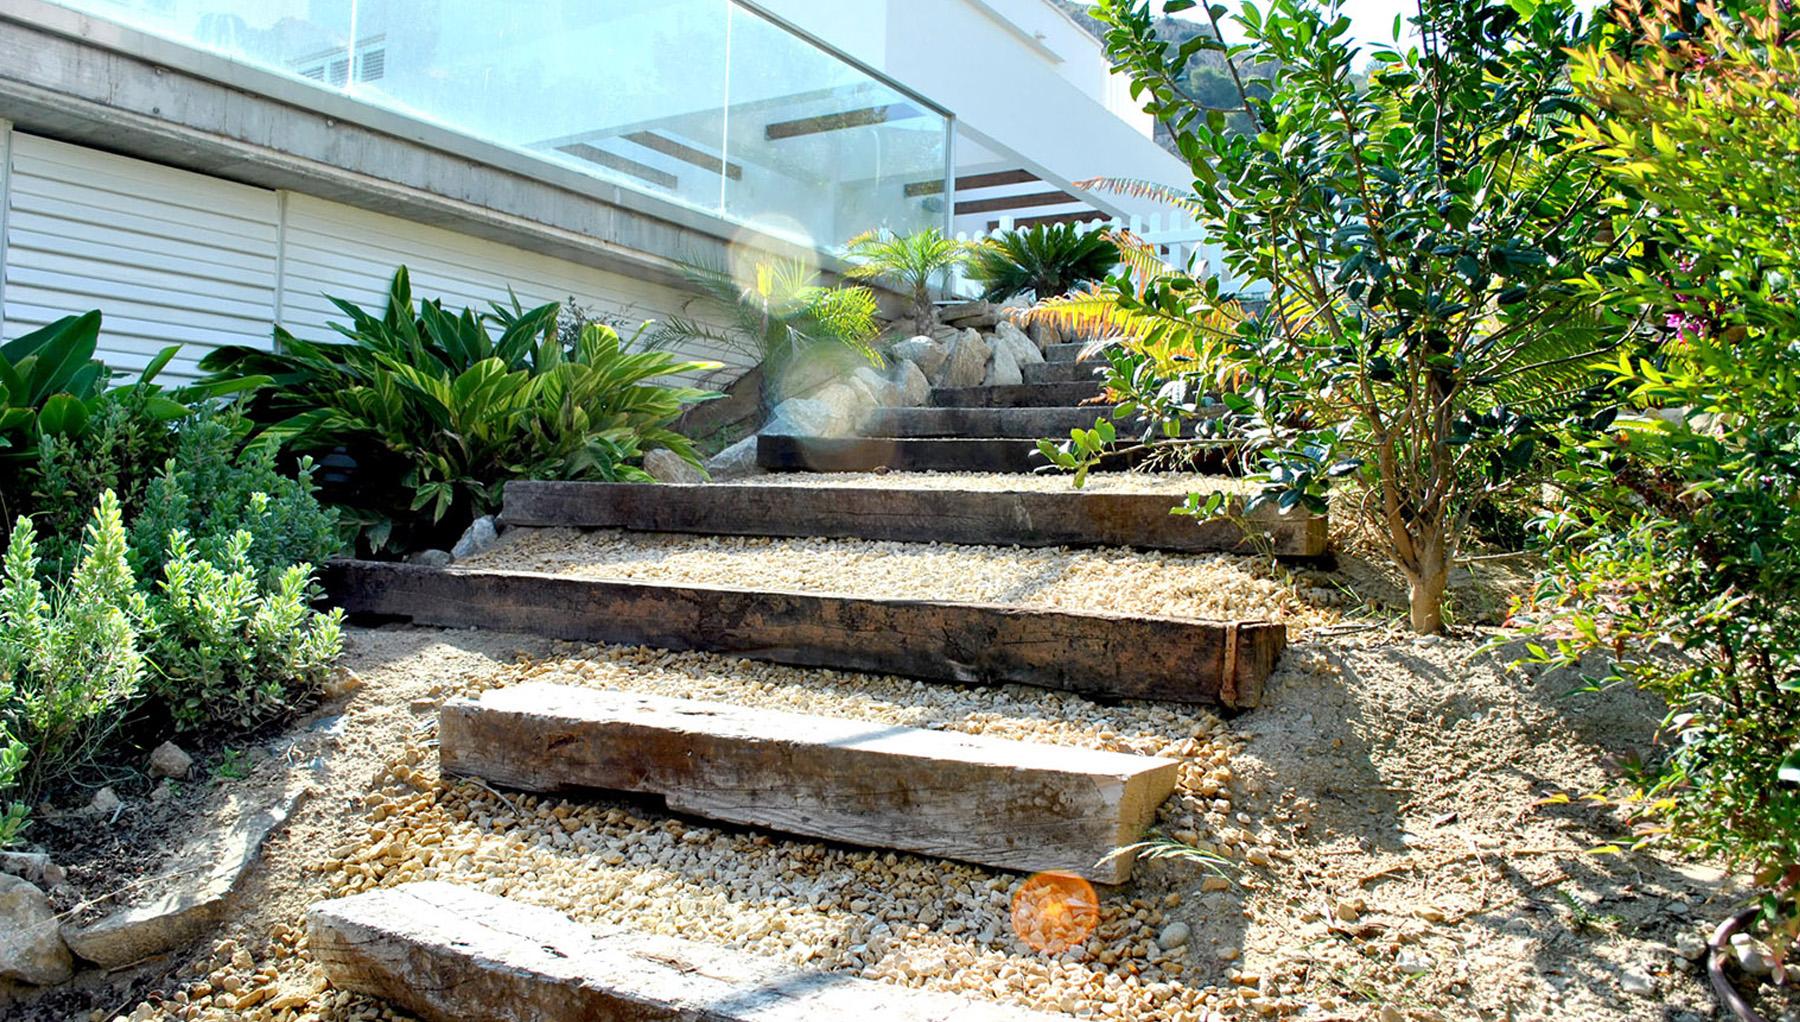 Servicios david jim nez arquitectura y paisajismo en madrid - Diseno jardines 3d ...